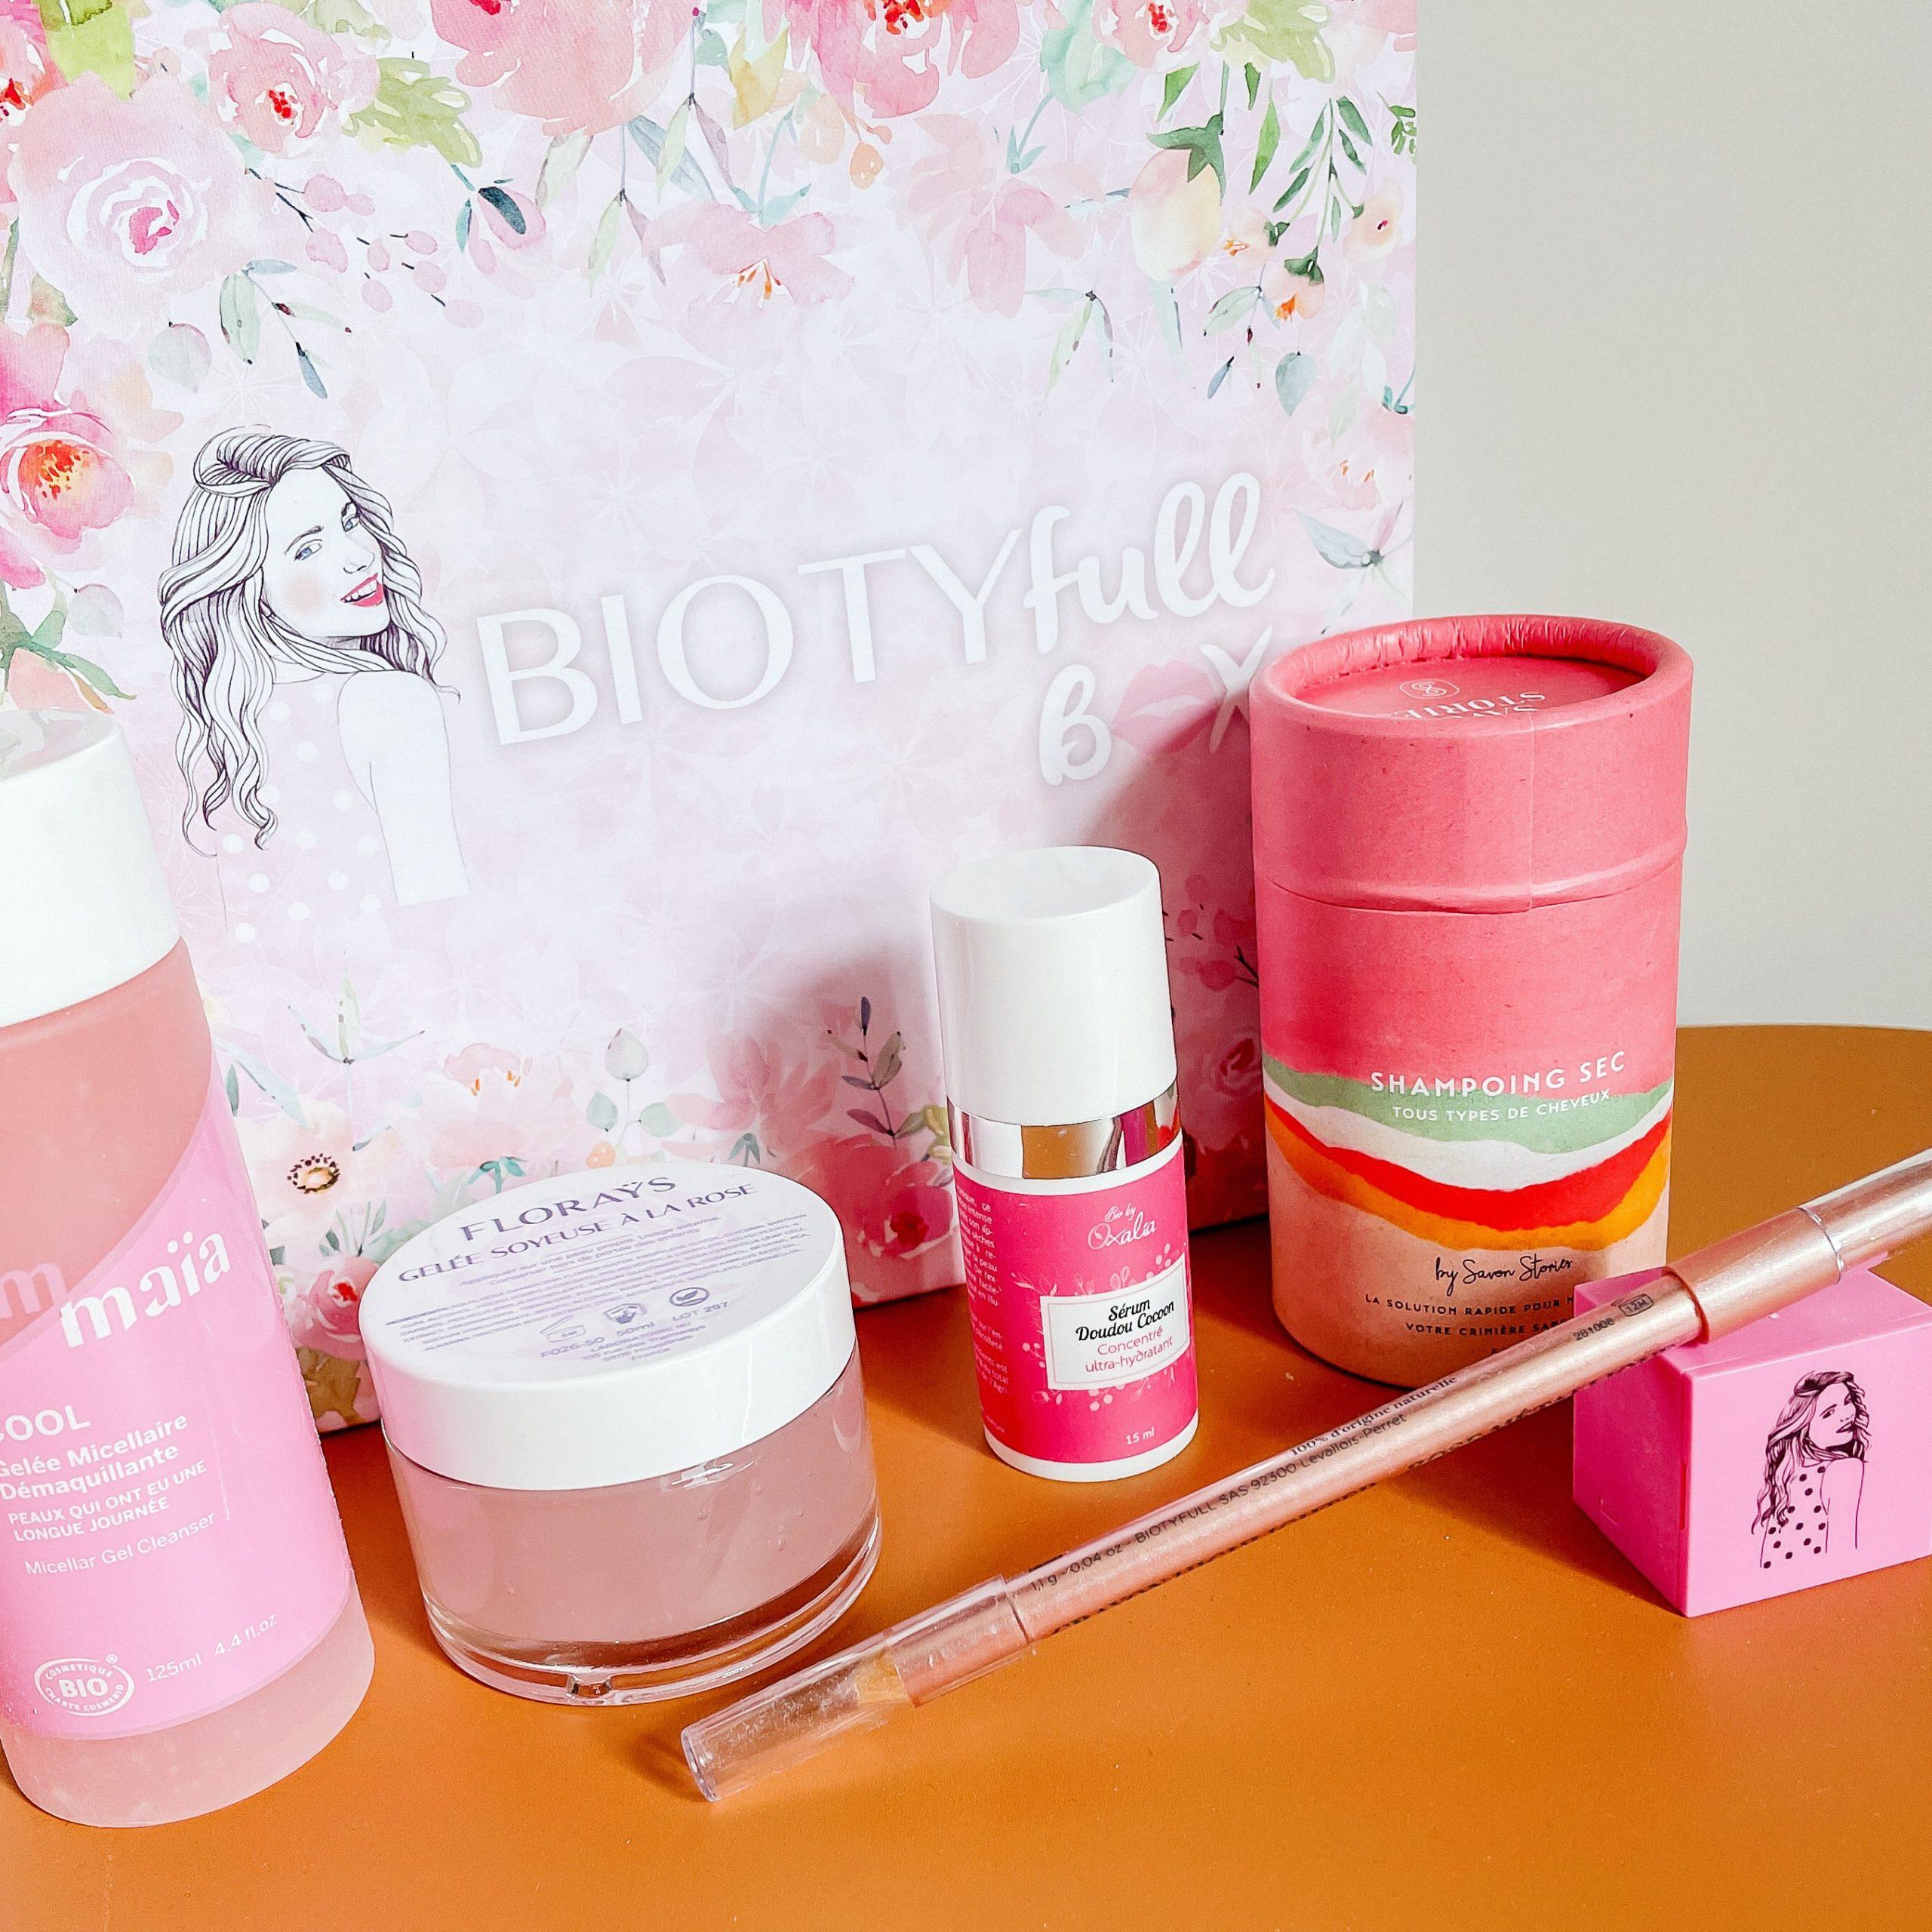 Biotyfullbox juin rosée morandmors beauty box soin visage corps blog lifestyle